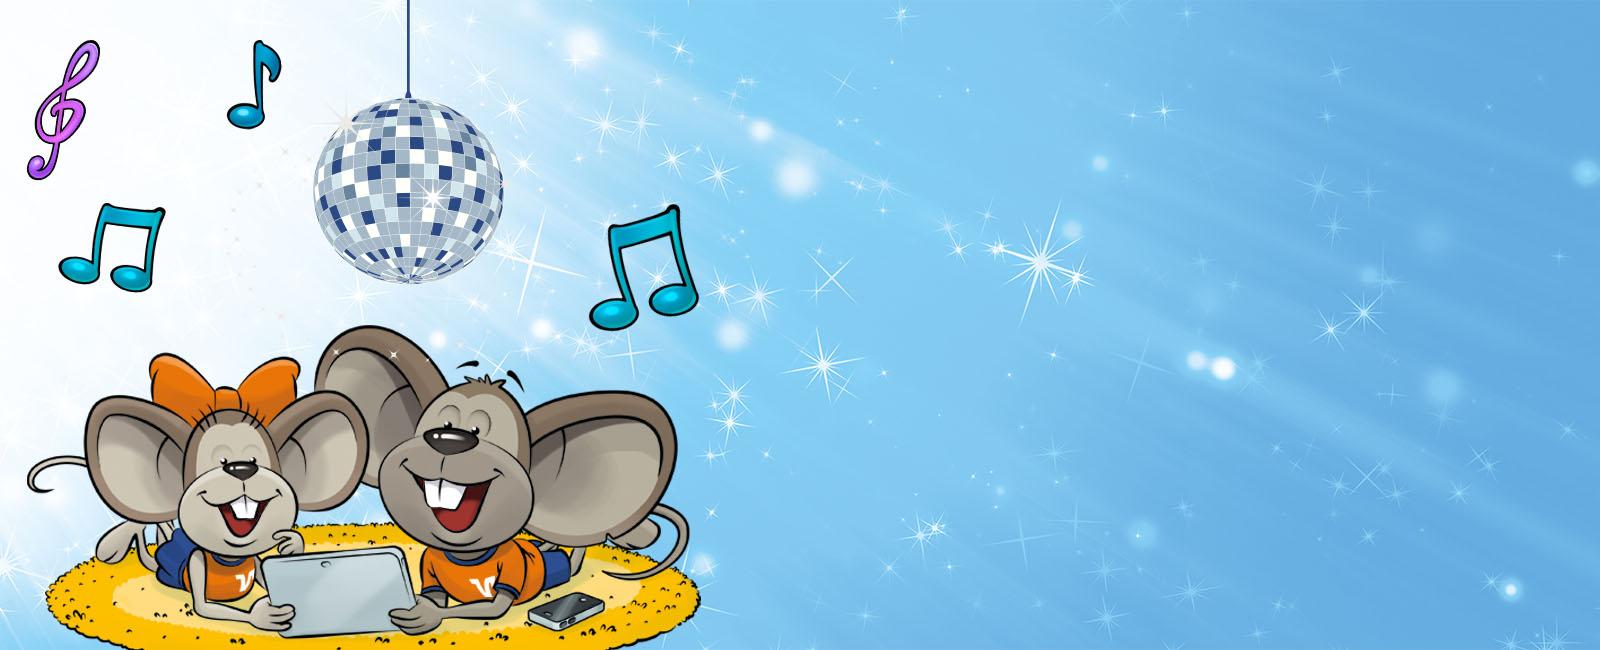 MäuseClub-Song